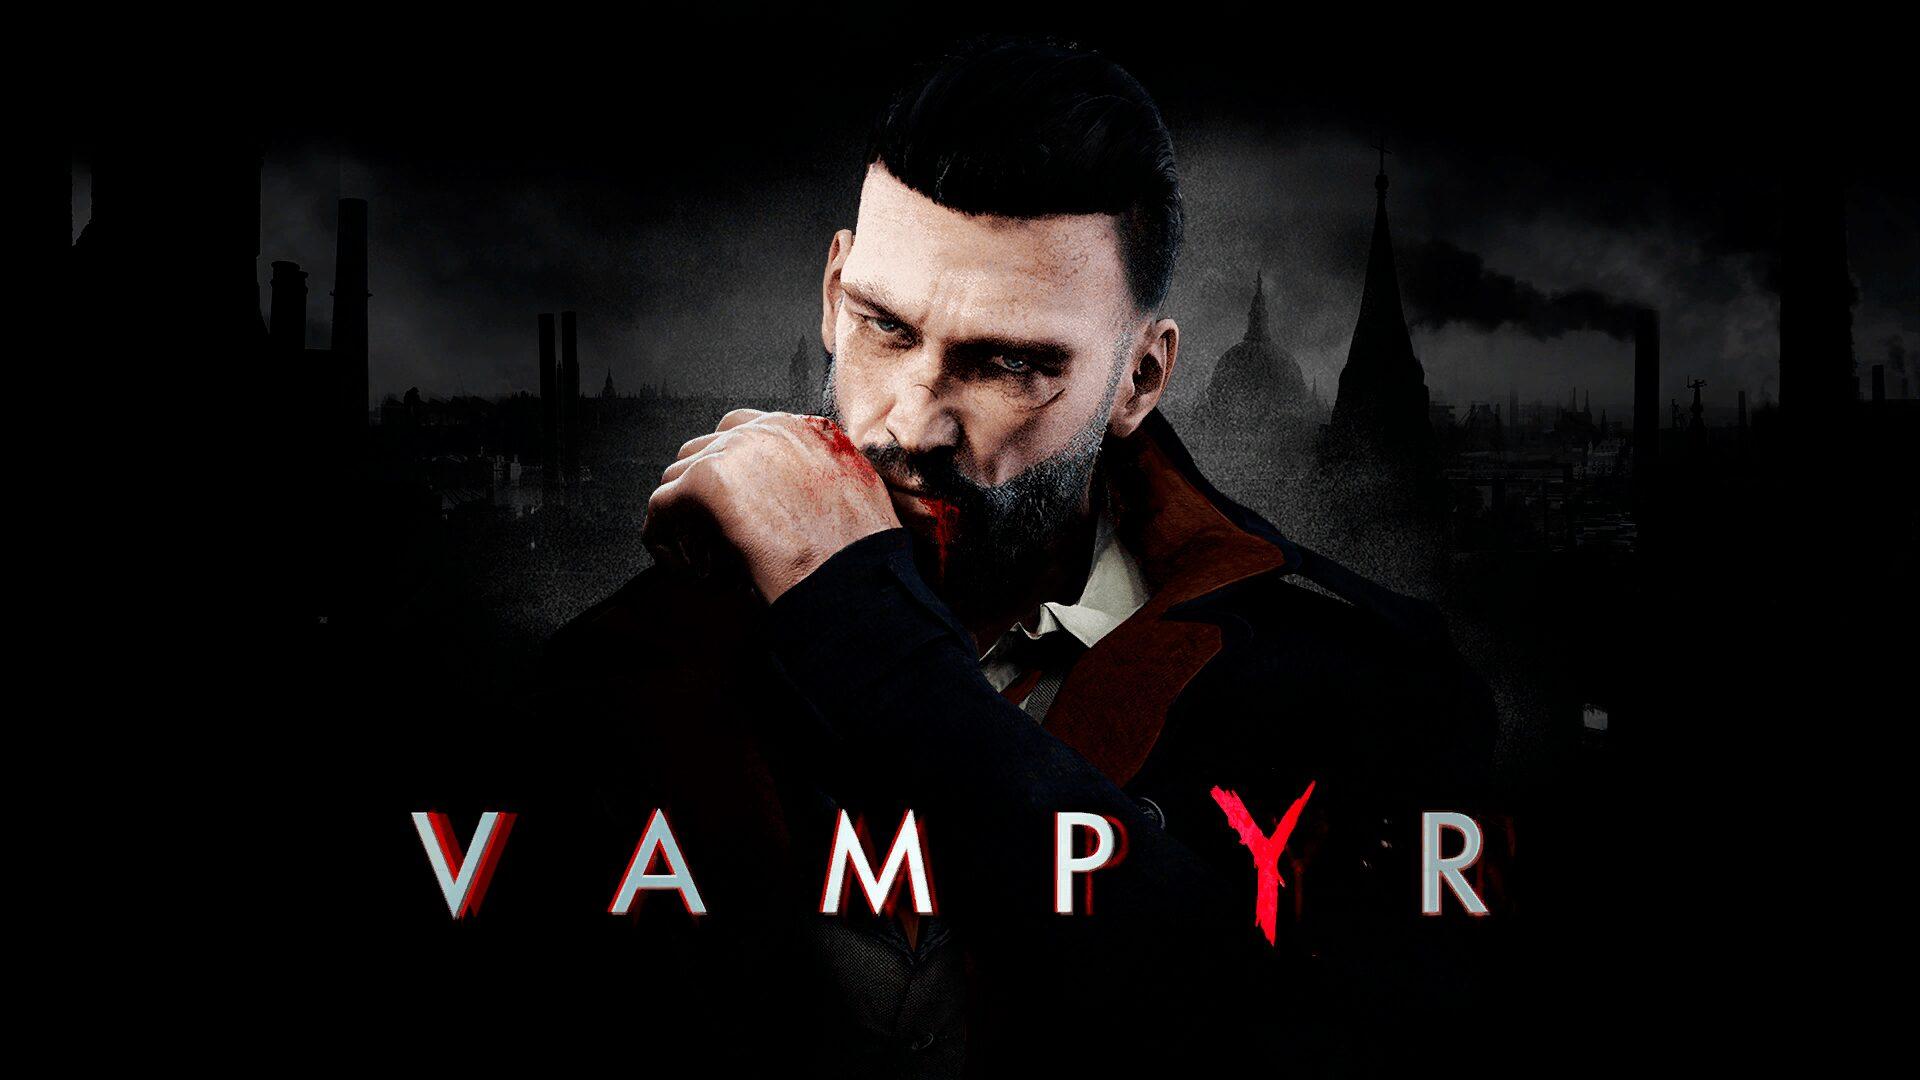 Vampyr_01-ecran titre